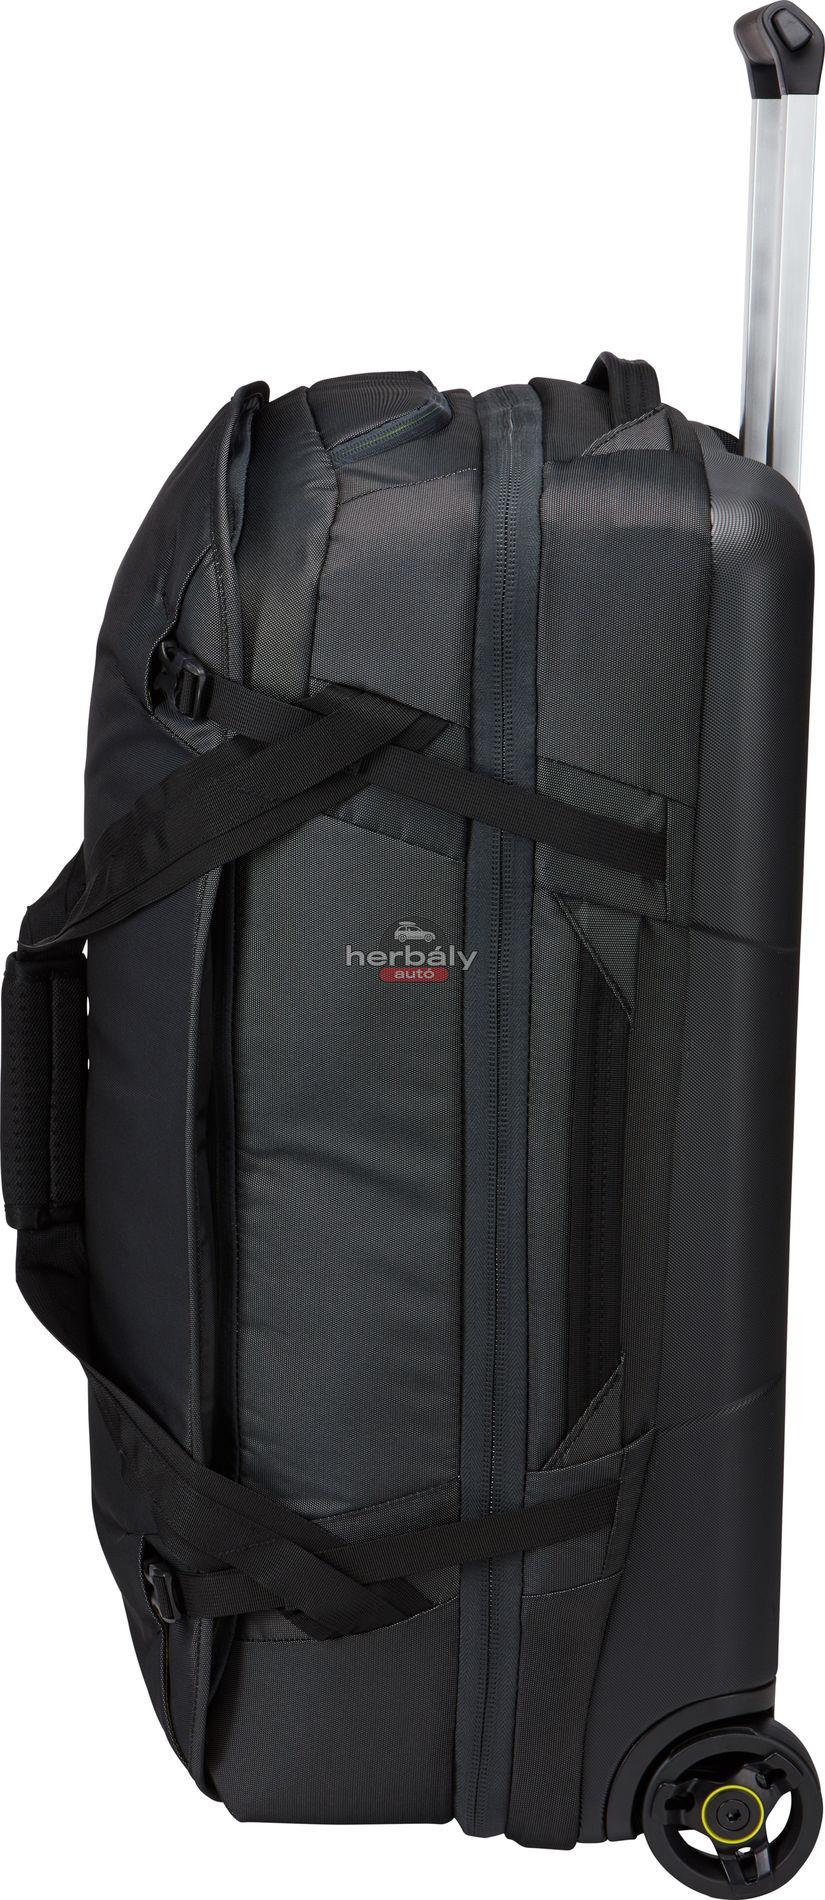 Thule Subterra TSR-375DSH 75L gurulós bőrönd, fekete